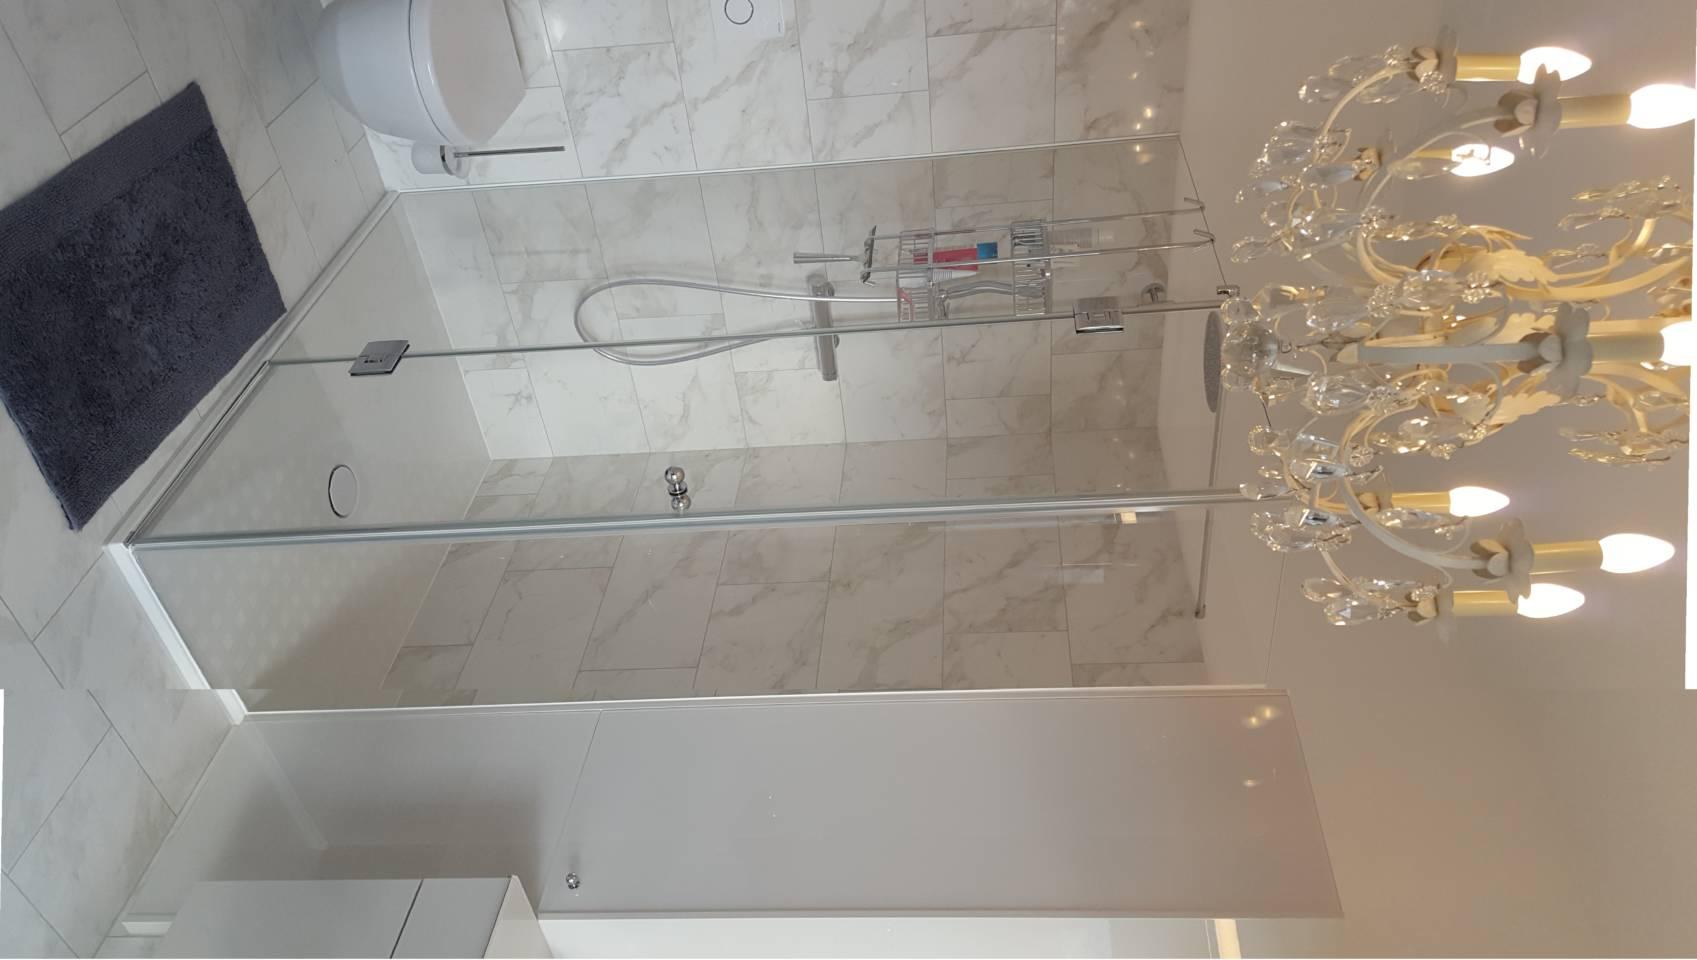 glasdusche duschkabine demenga glas ag. Black Bedroom Furniture Sets. Home Design Ideas